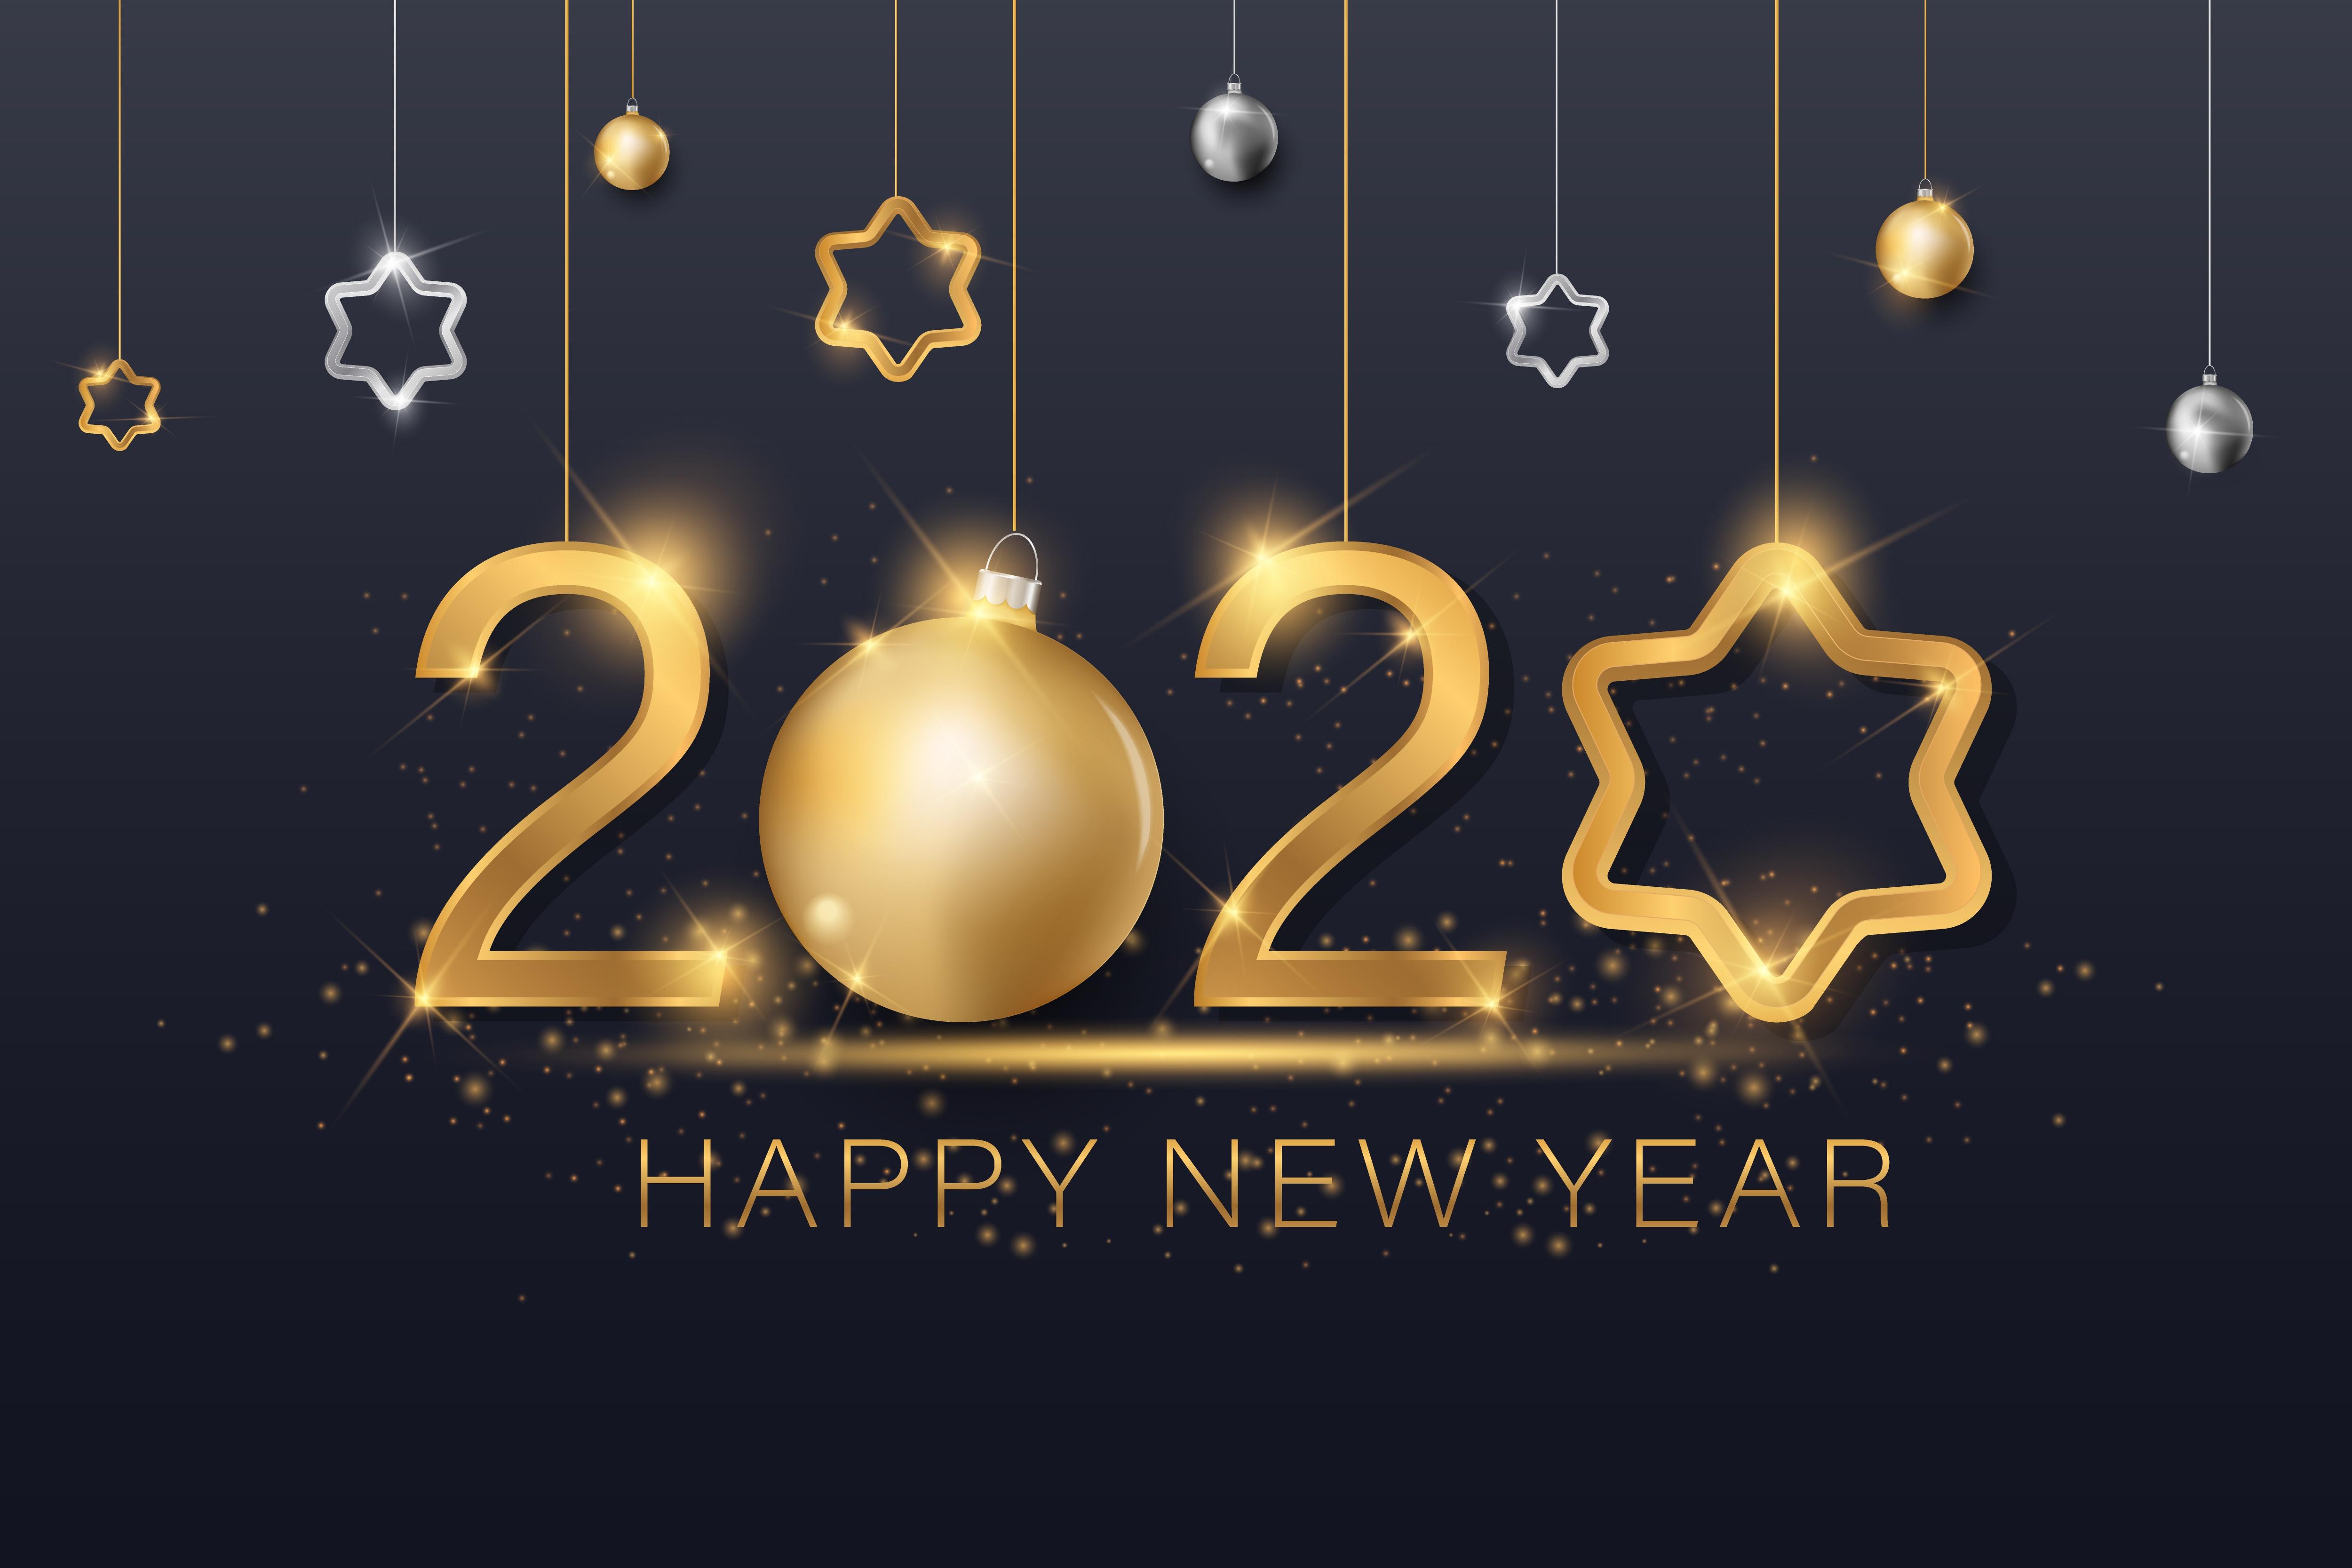 New Year 2020 4k Ultra HD Wallpaper Background Image 5000x3333 5000x3333